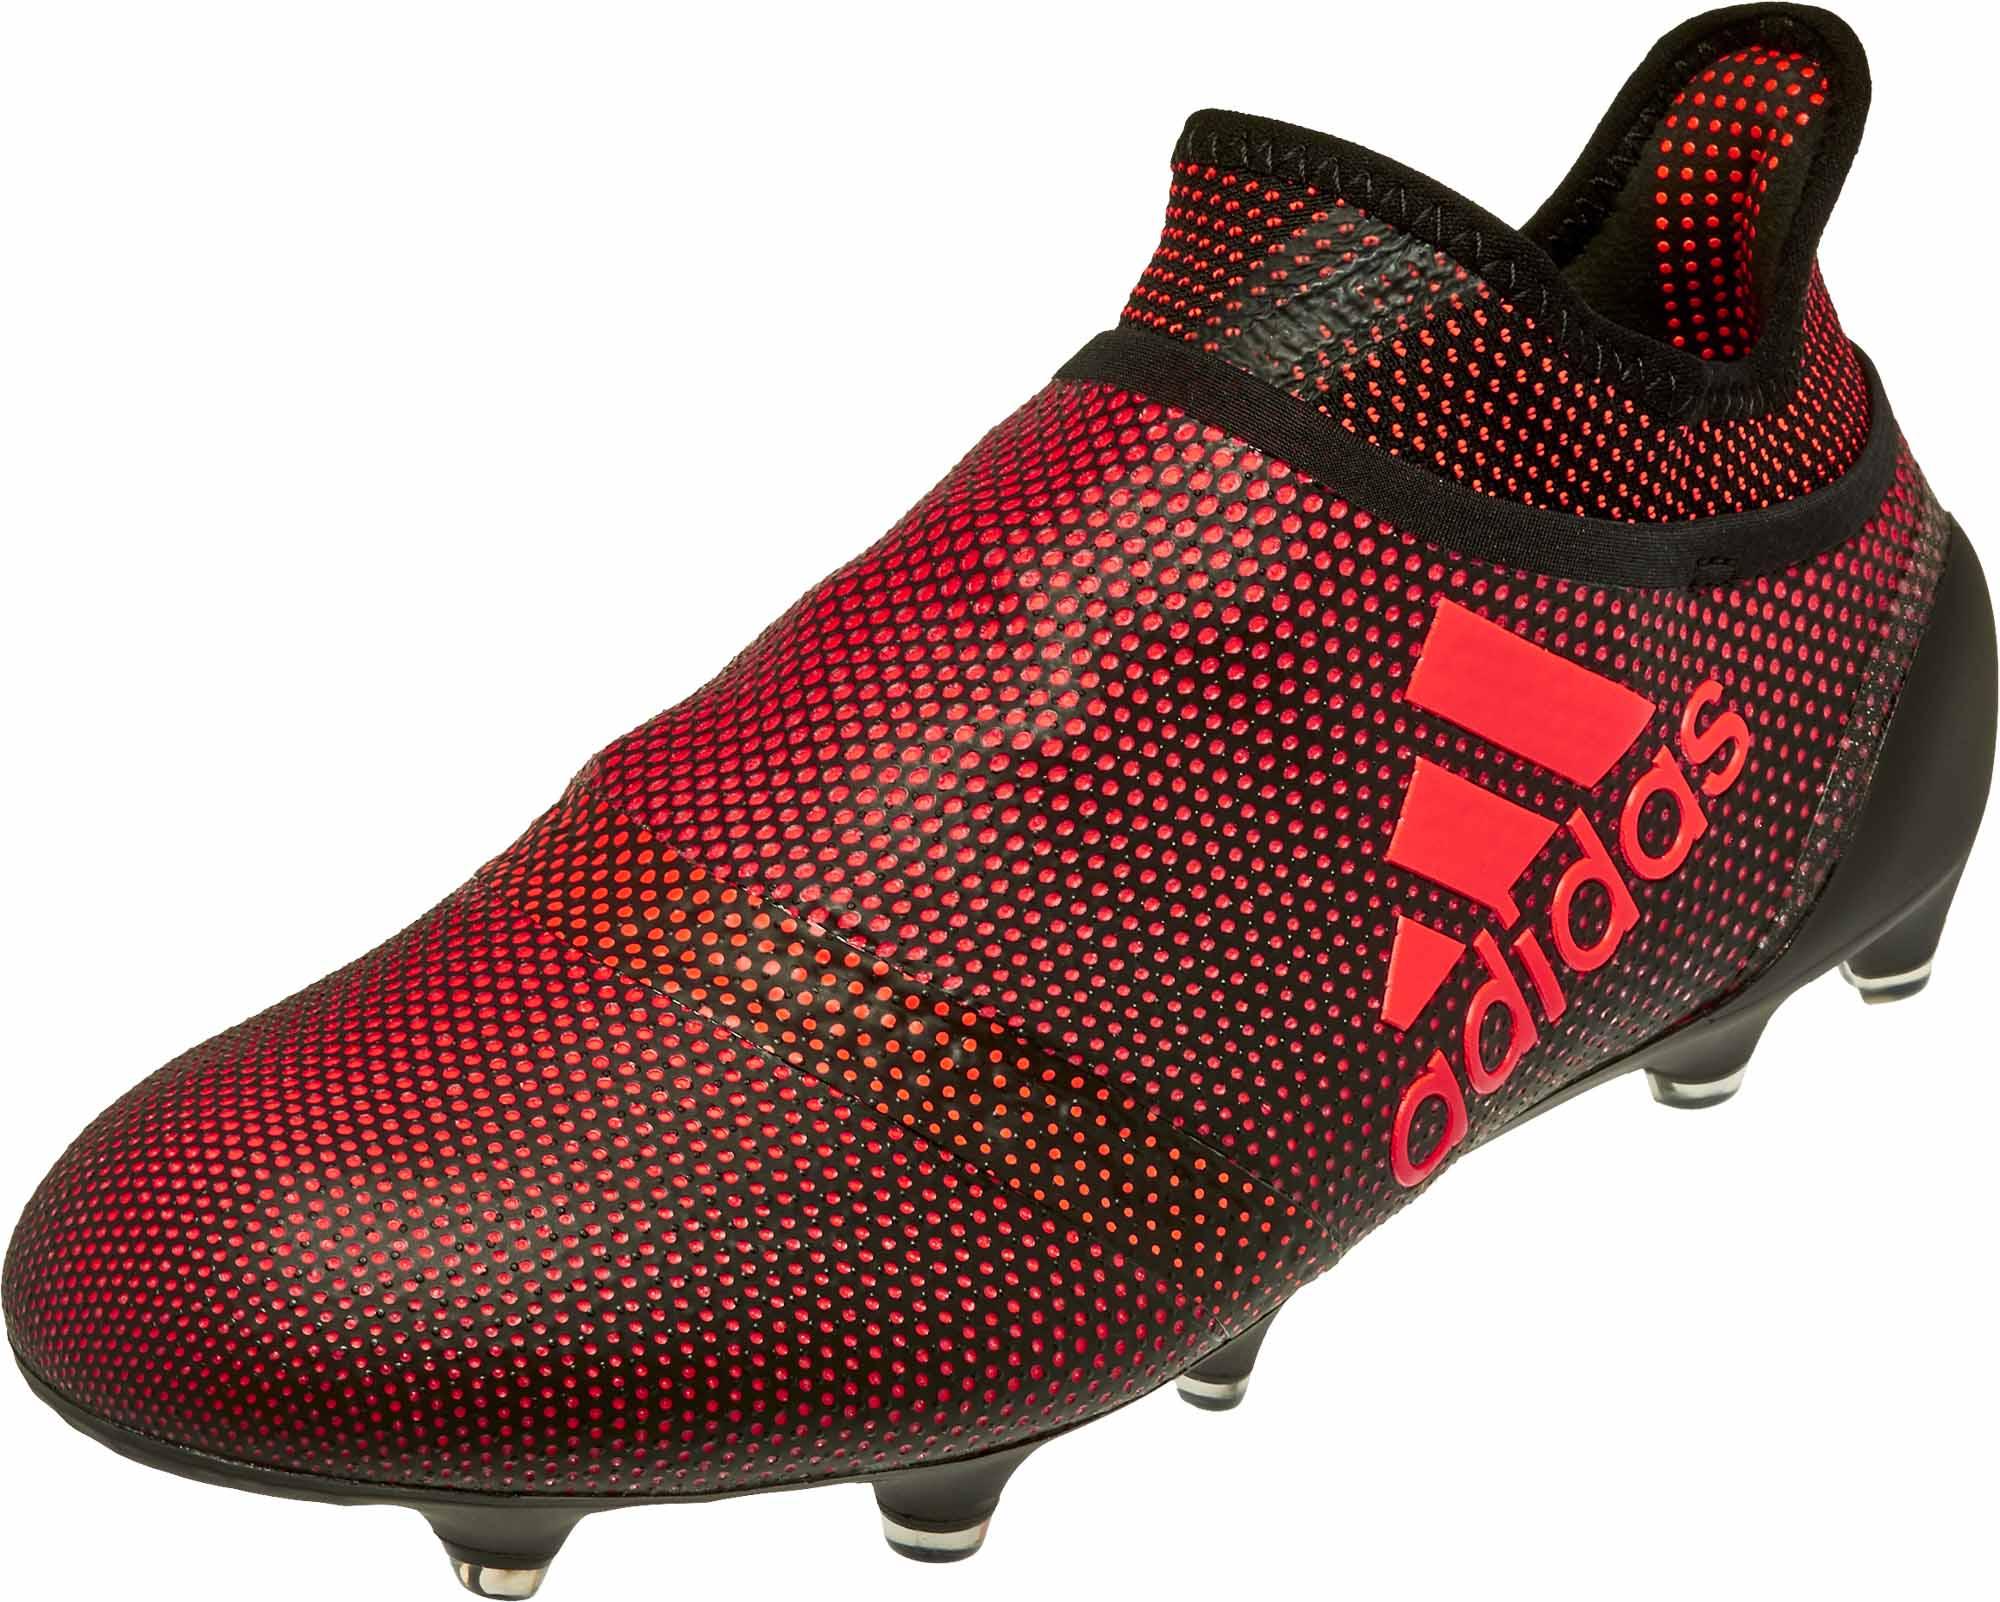 3860d4baf adidas X 17 PureSpeed FG - adidas X Soccer Cleats